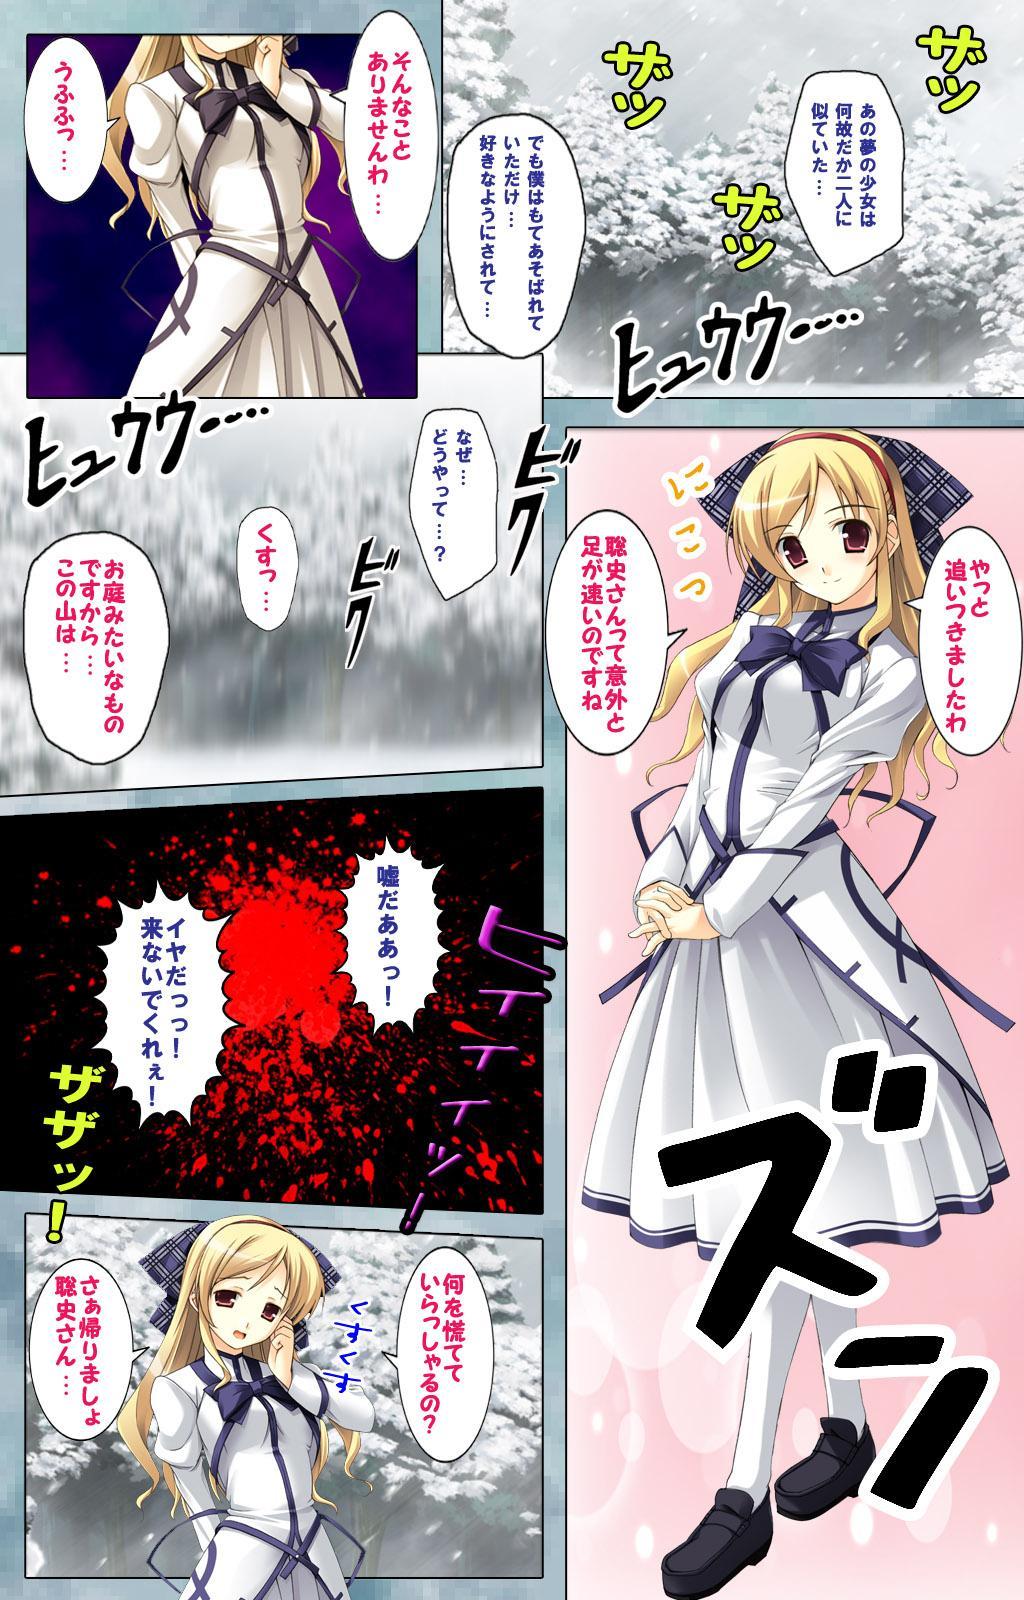 [Applemint] [Full Color seijin ban] Bijin shimai no yuwaku ~ himegoto ni oboreru otoko ~ Complete ban 28